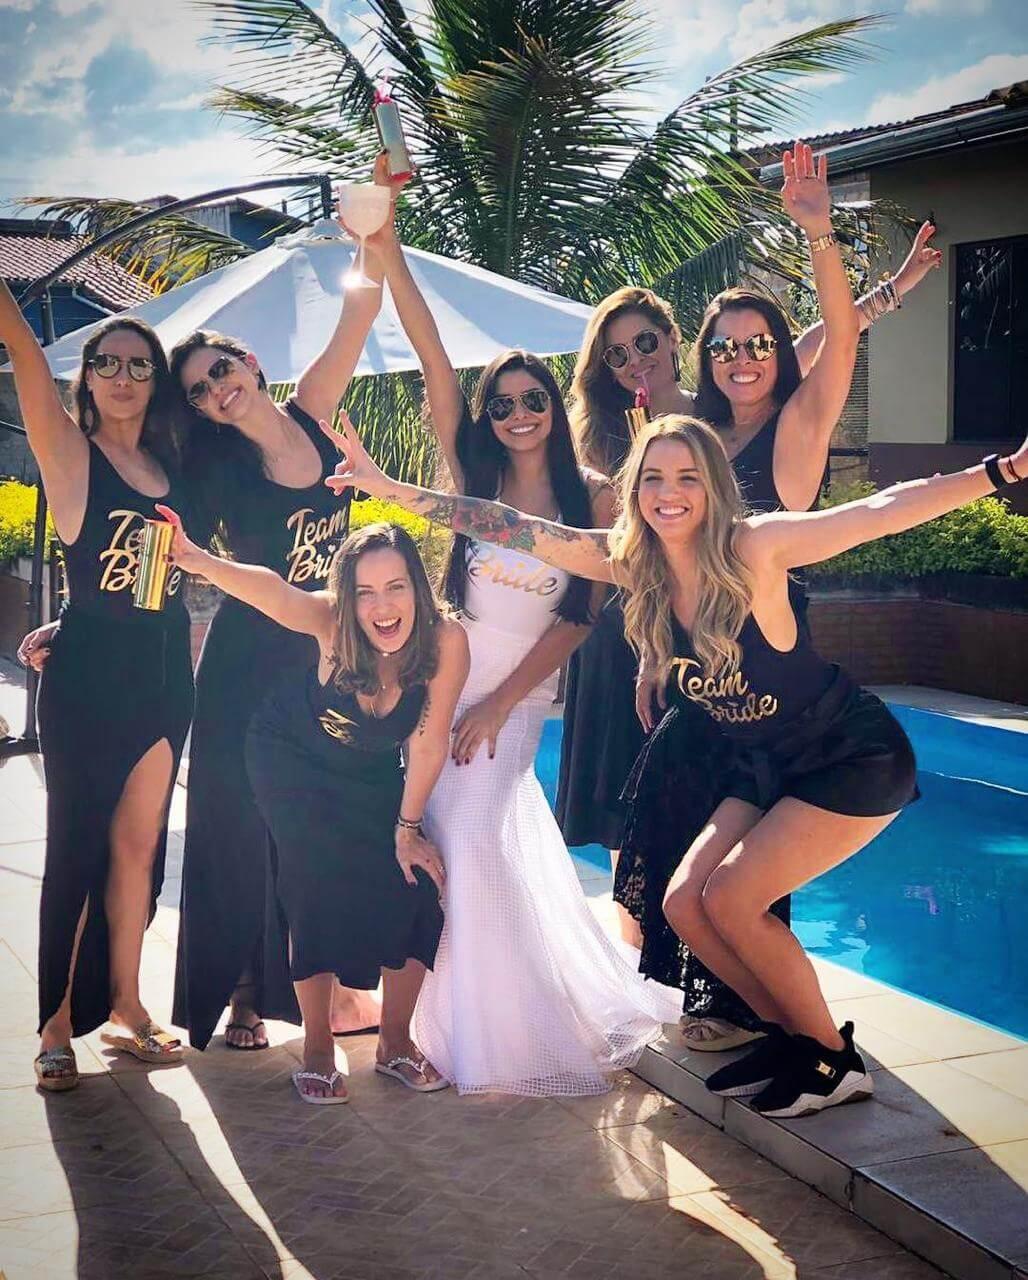 Body Cavado Team Bride Pronta Entrega para Despedida de Solteira